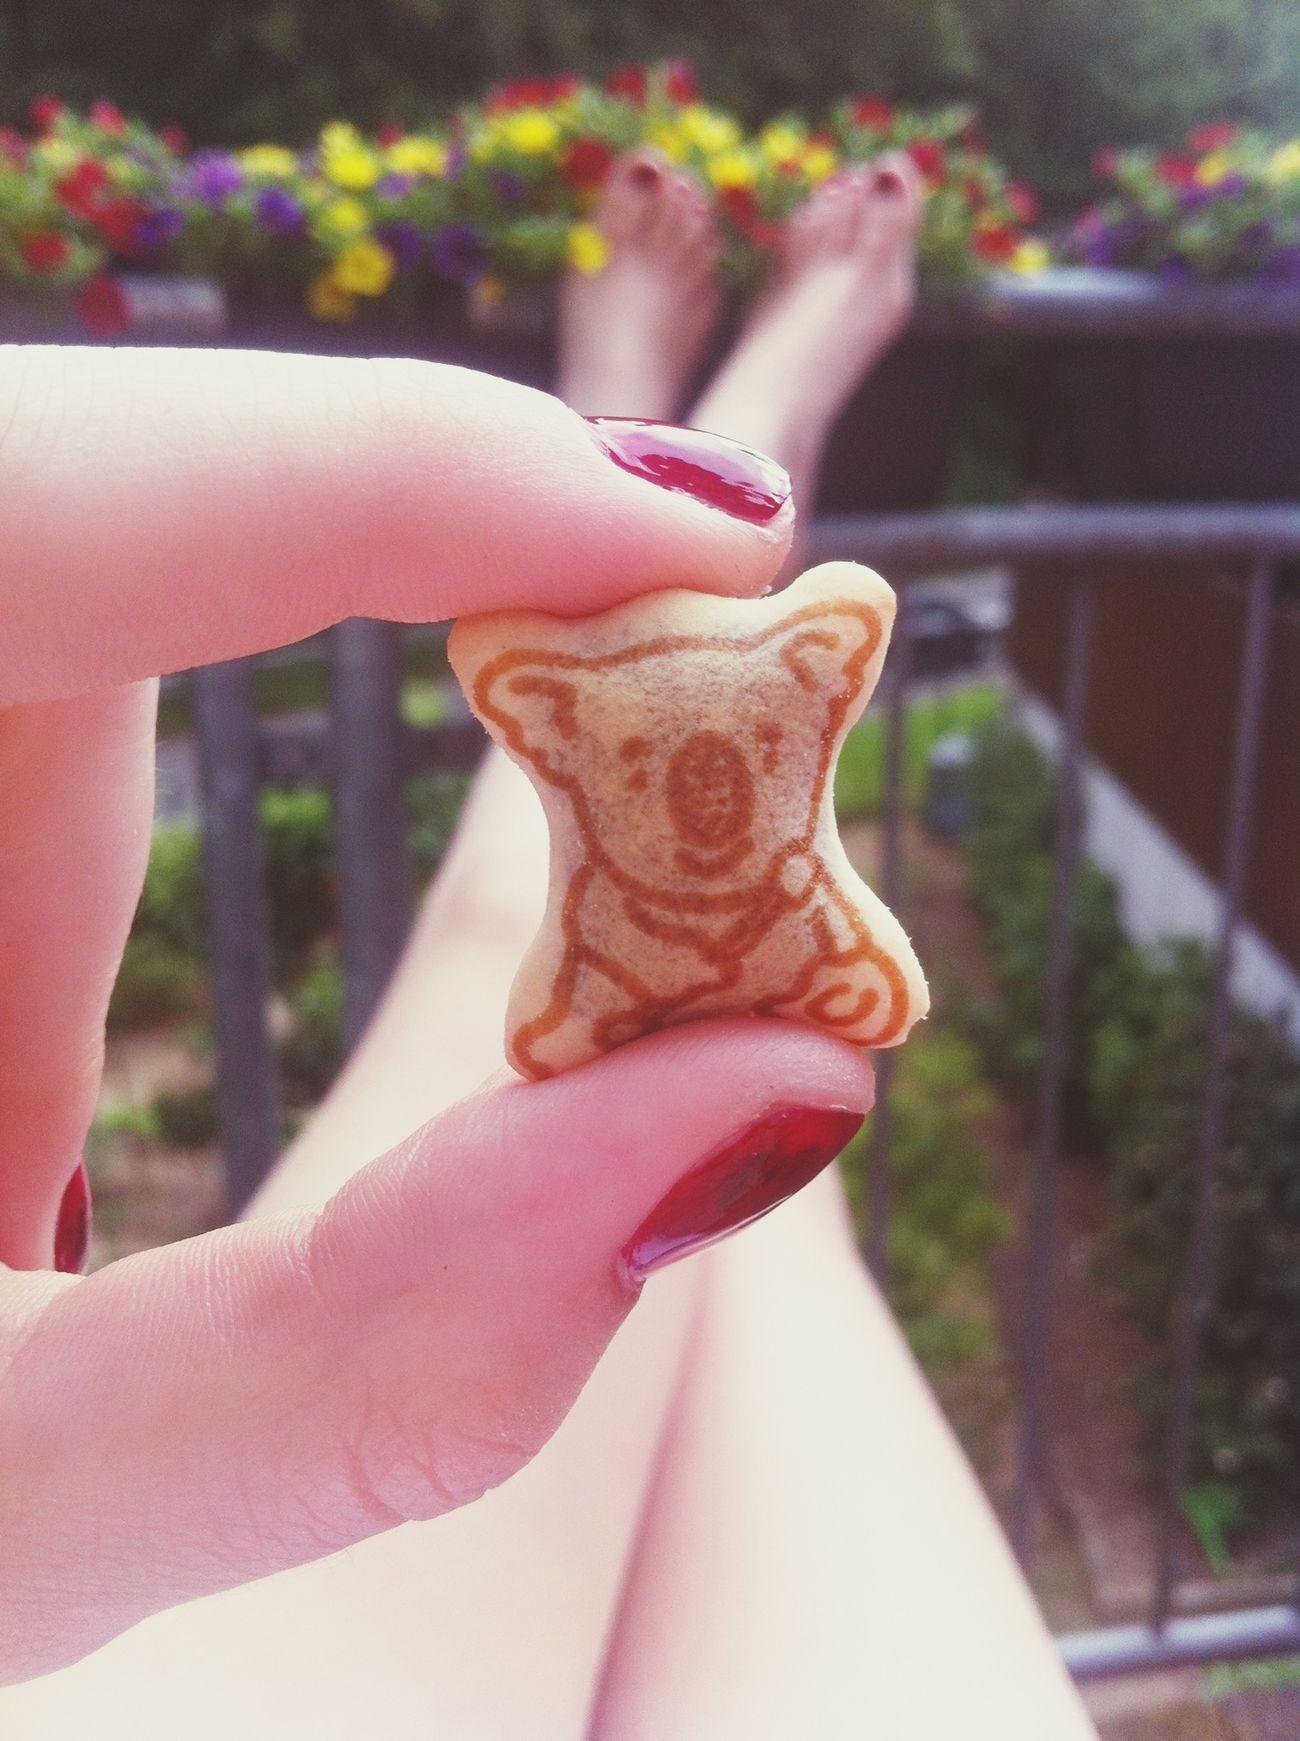 Schokolade Koala Childhood Memories ❤️